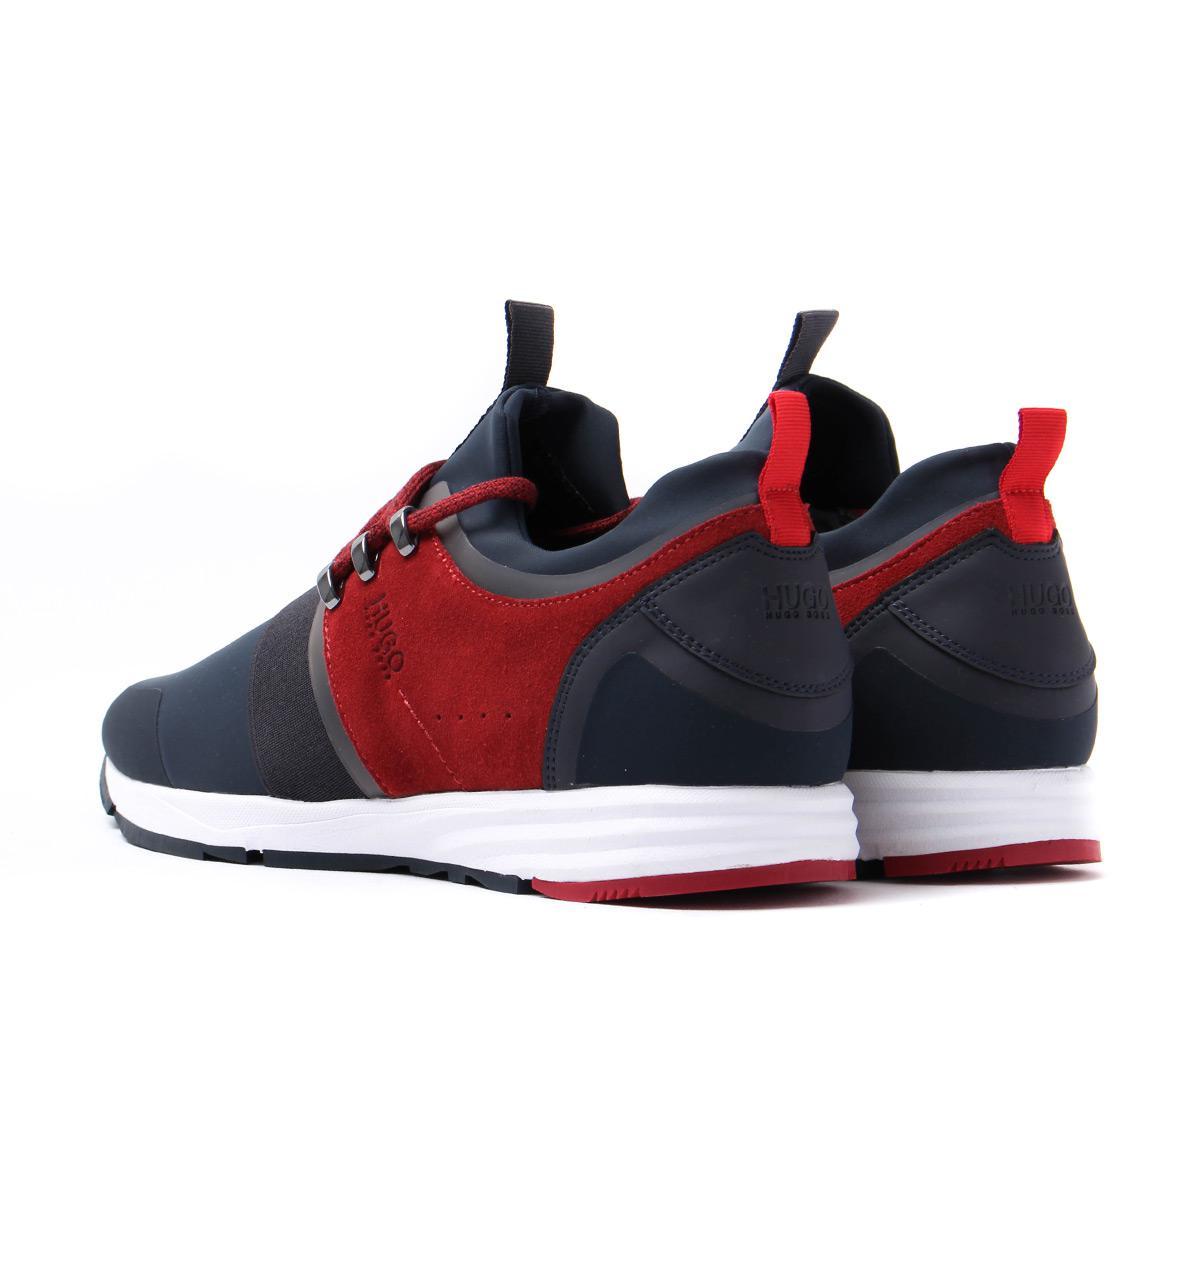 Hugo Boss Running Shoes Canada